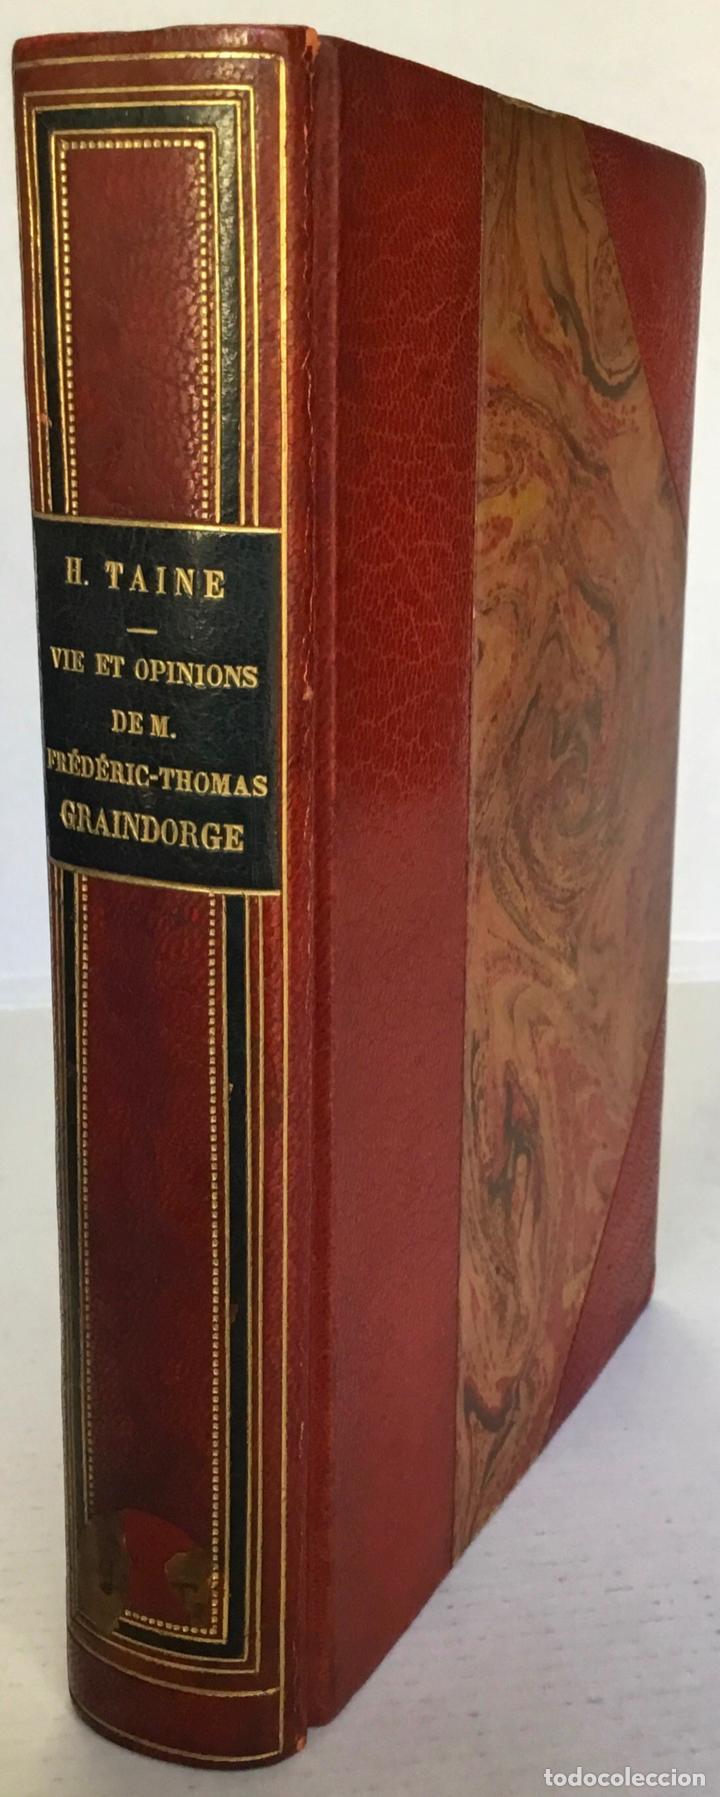 VIE ET OPINIONS DE M. FRÉDÉRIC-THOMAS GRAINDORGE. NOTES SUR PARIS. RECUEILLIES ET PUBLIÉES PAR... (Libros Antiguos, Raros y Curiosos - Pensamiento - Política)